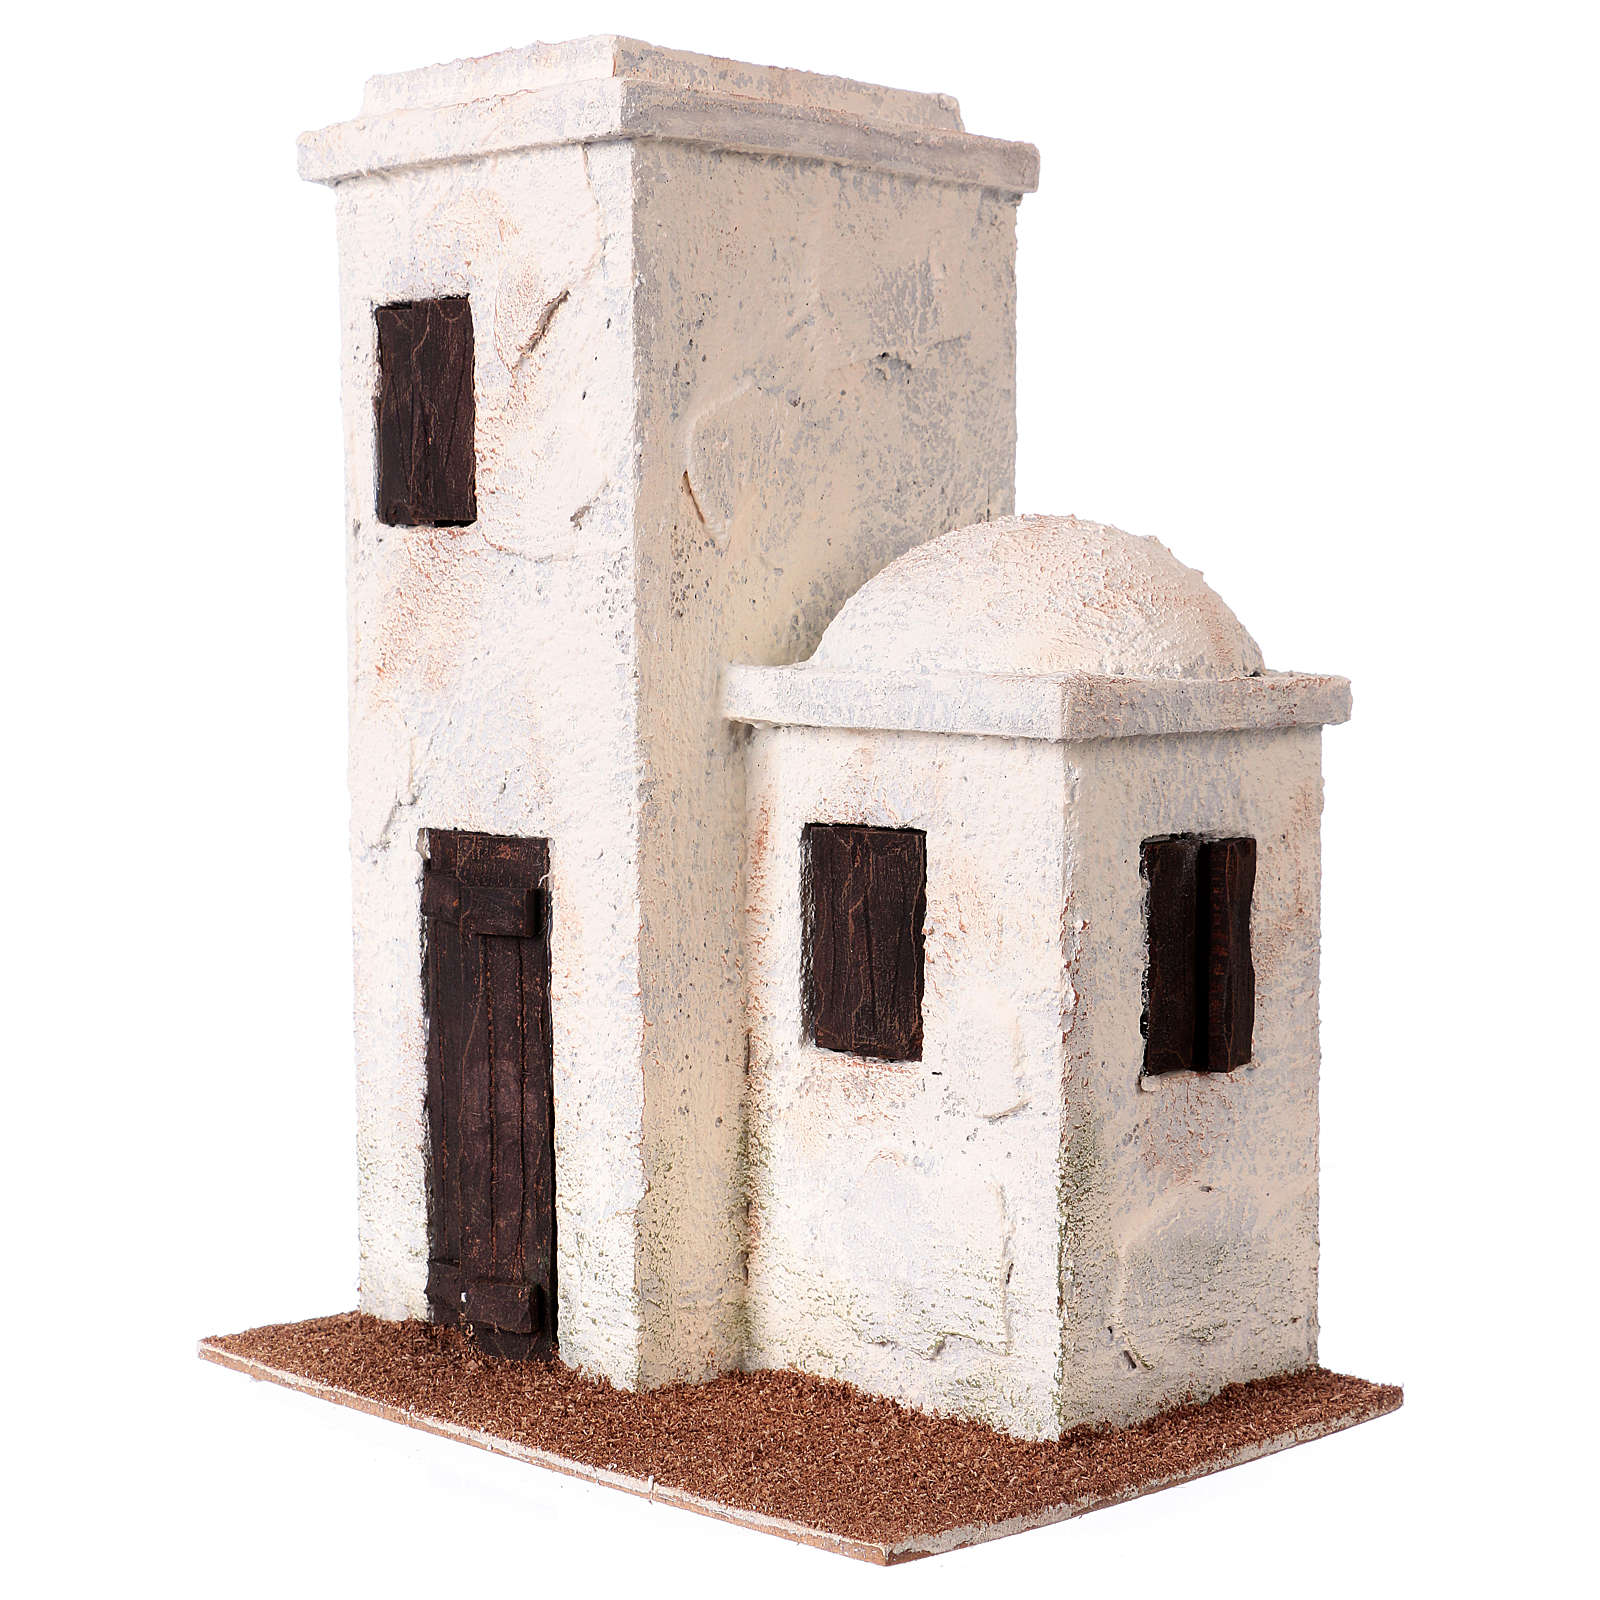 Nativity scene setting, Palestinian house with porch 25x20x15 cm for 9 cm Nativity scene 4